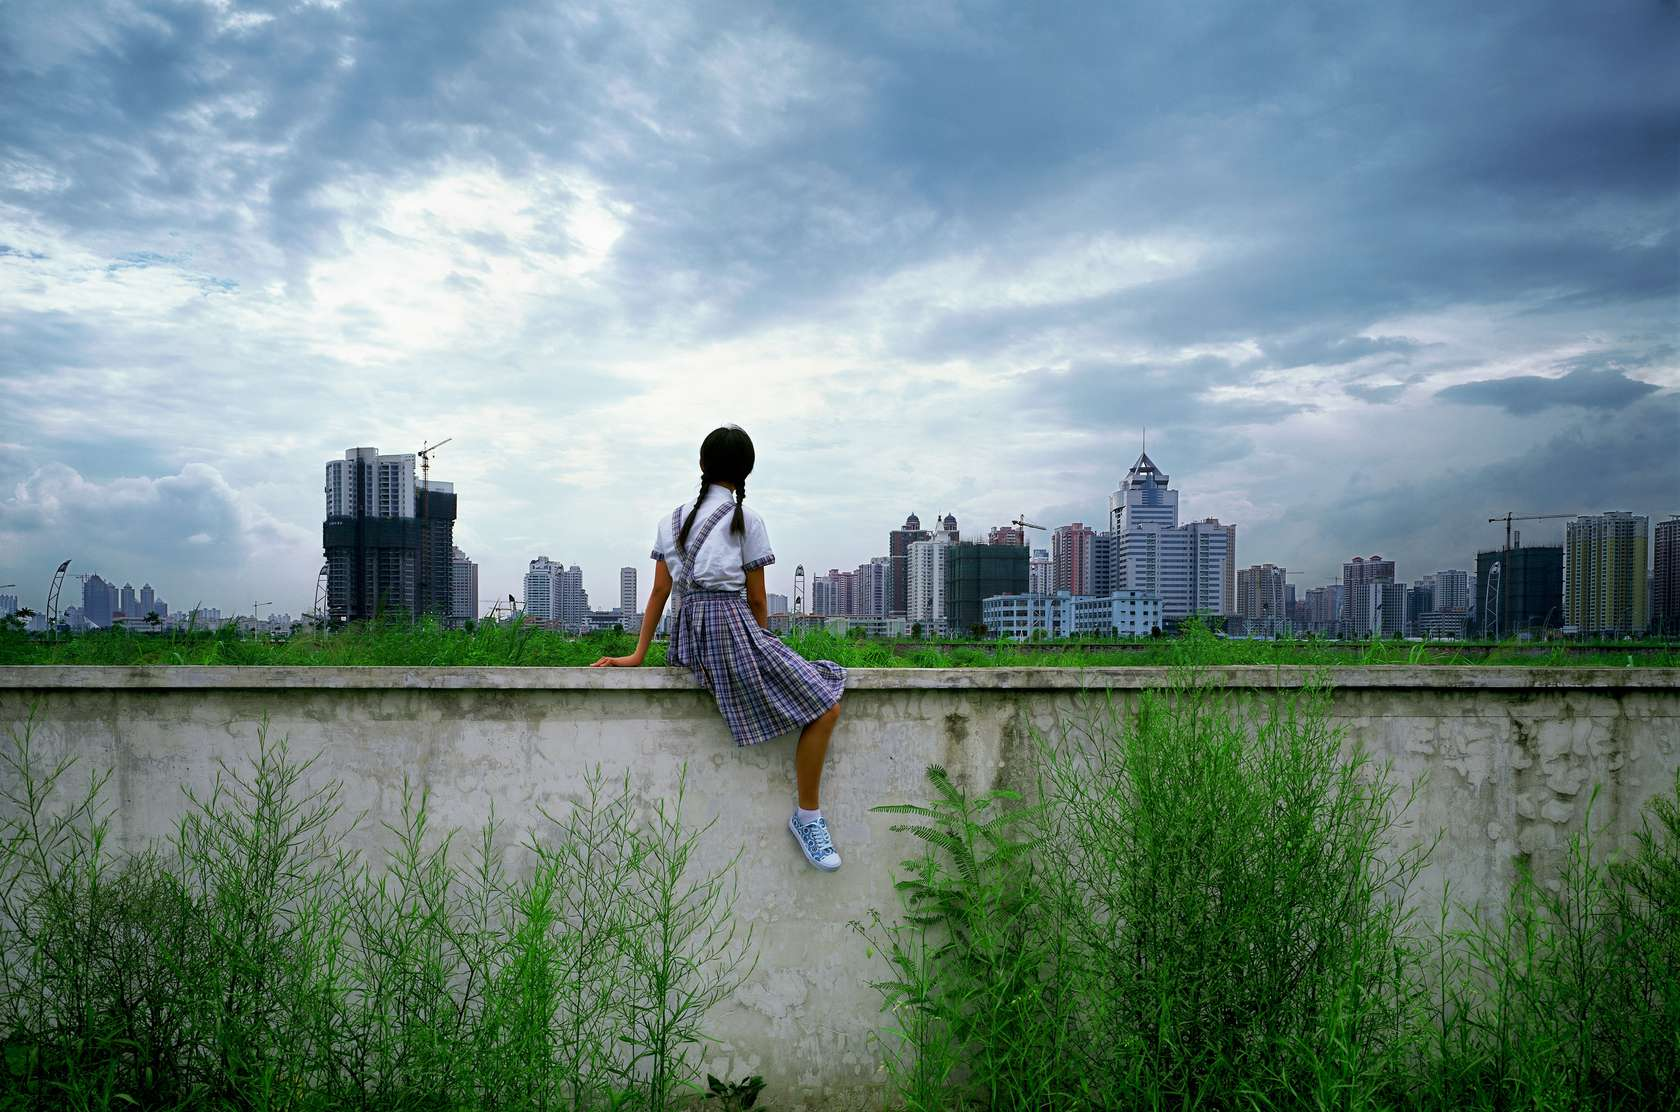 Weng Fen verso nuovi orizzonti